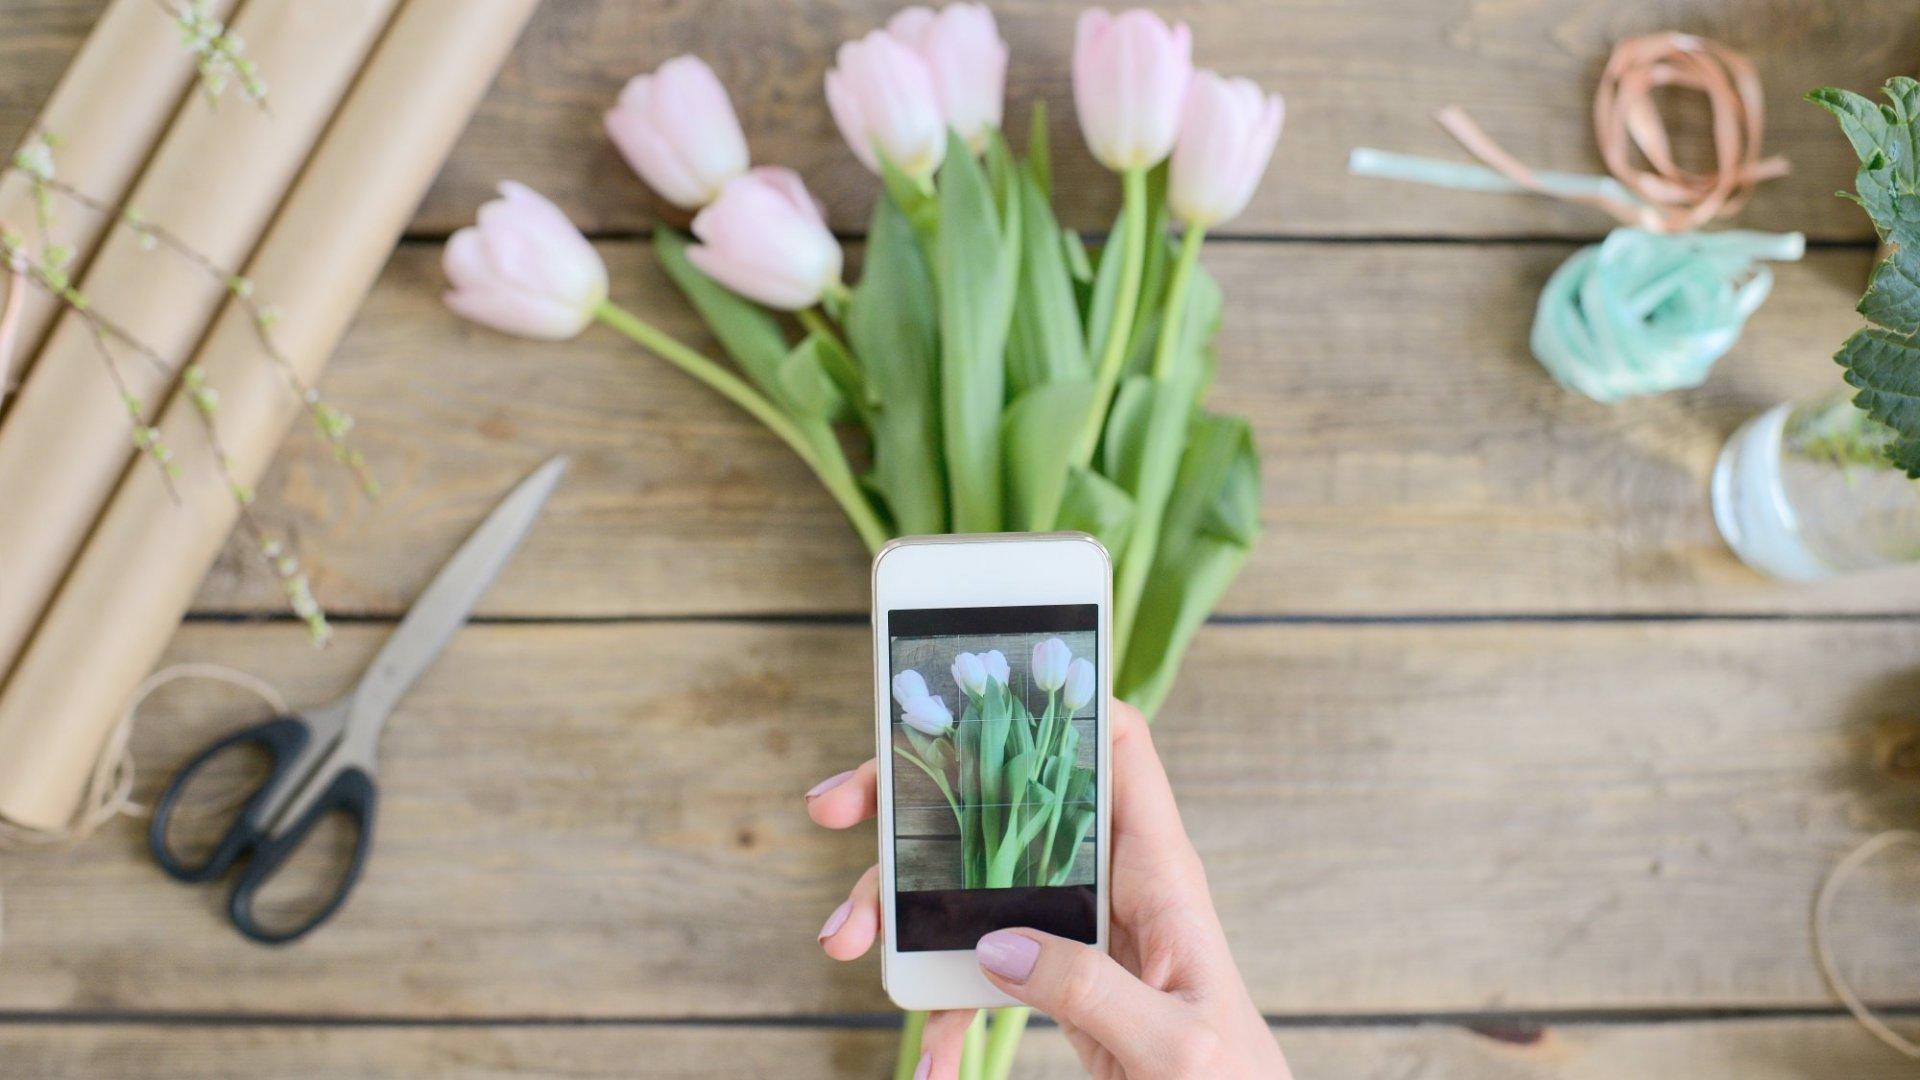 Does Instagram Make Sense for My Business?